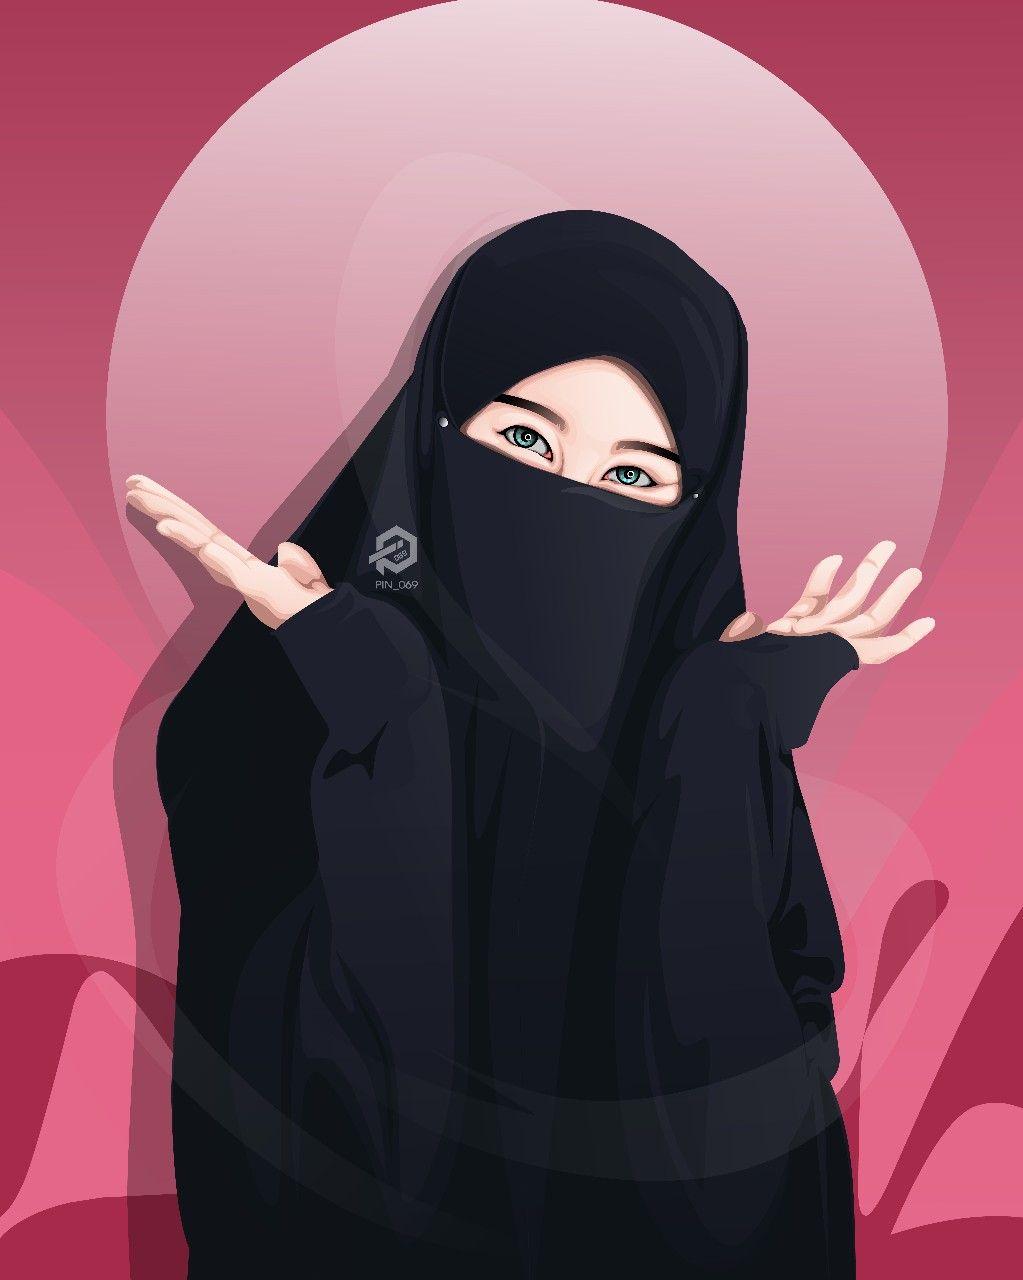 Hijab Cartoon Girl Wallpapers Wallpaper Cave